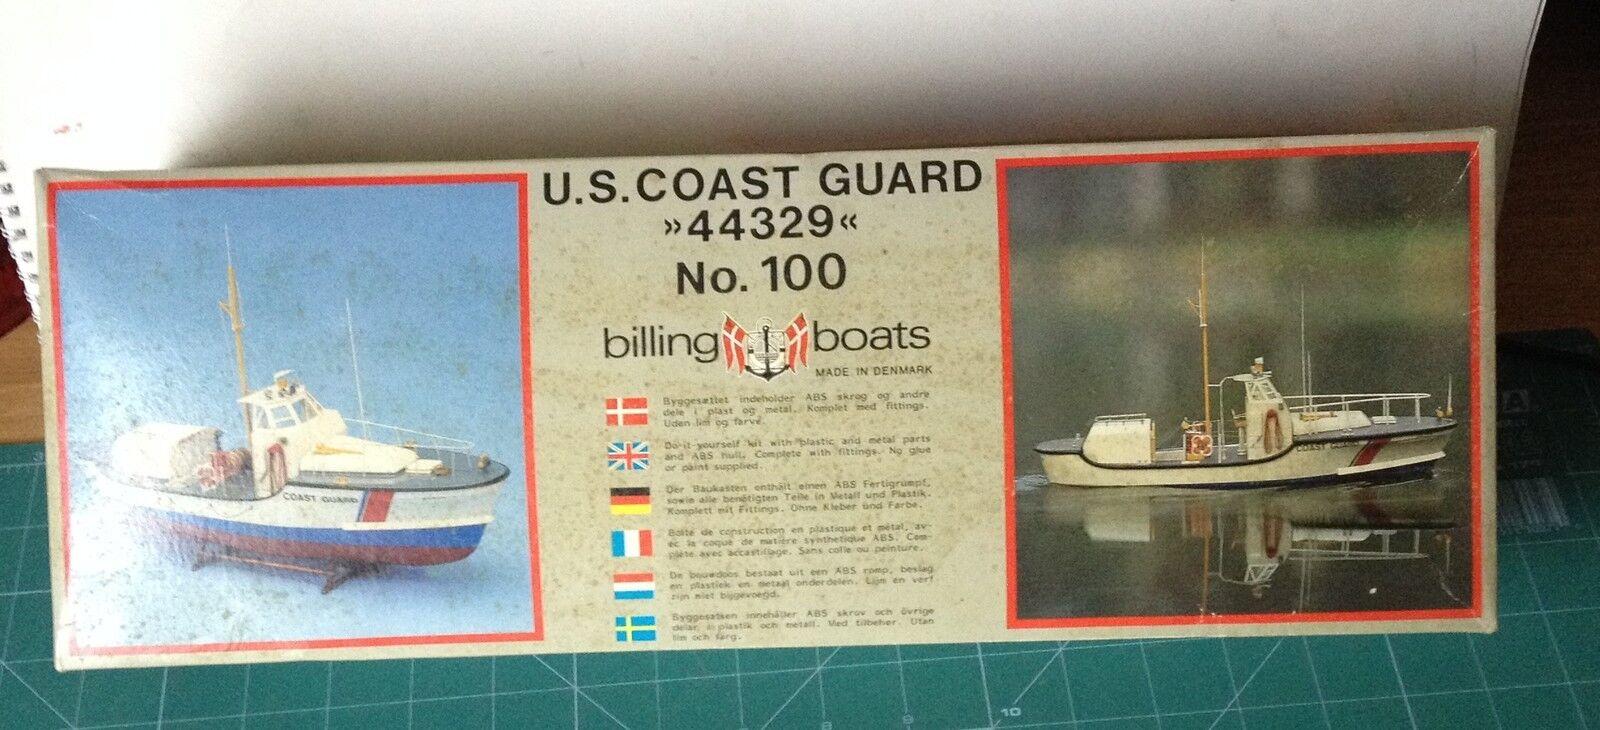 Billing Boats-B 100-U.s Coast Guard Modelo Barco Kit 1 40 Escala Nuevo En Caja